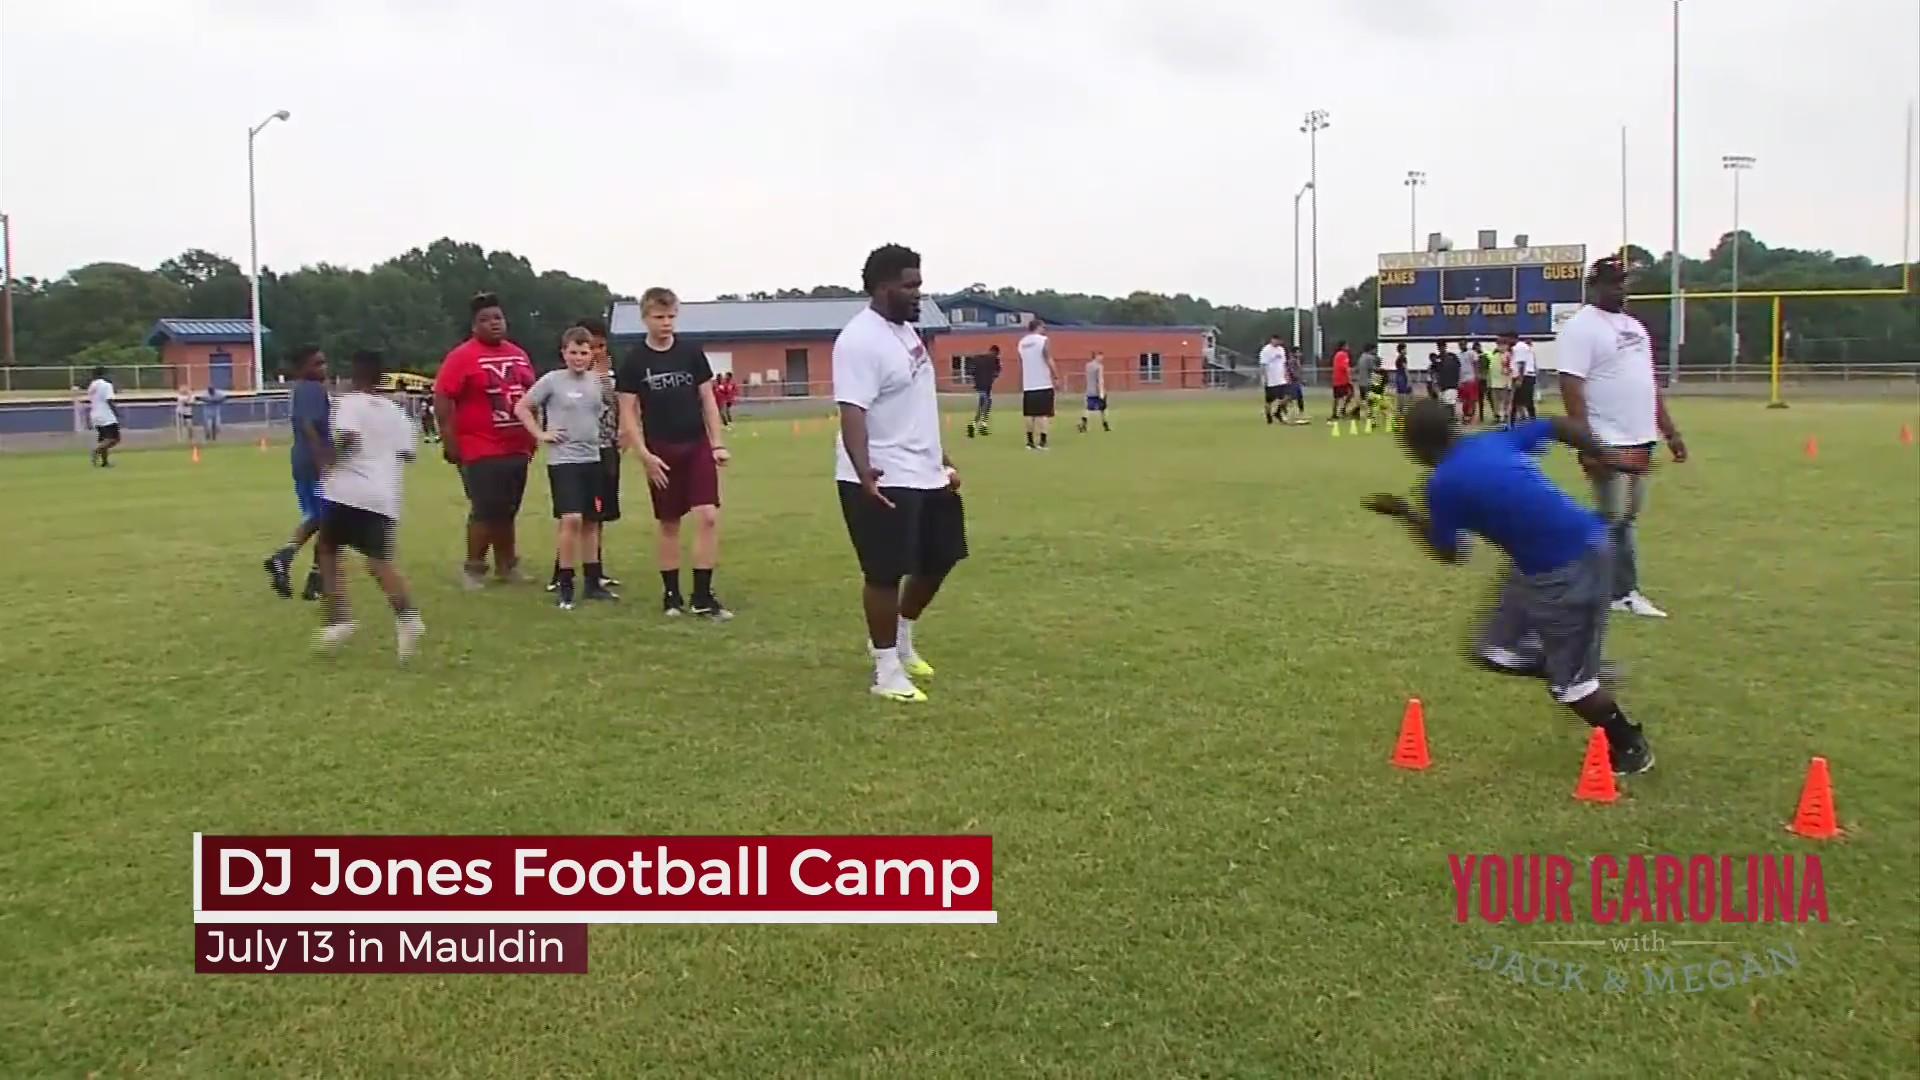 DJ Jones Football Camp